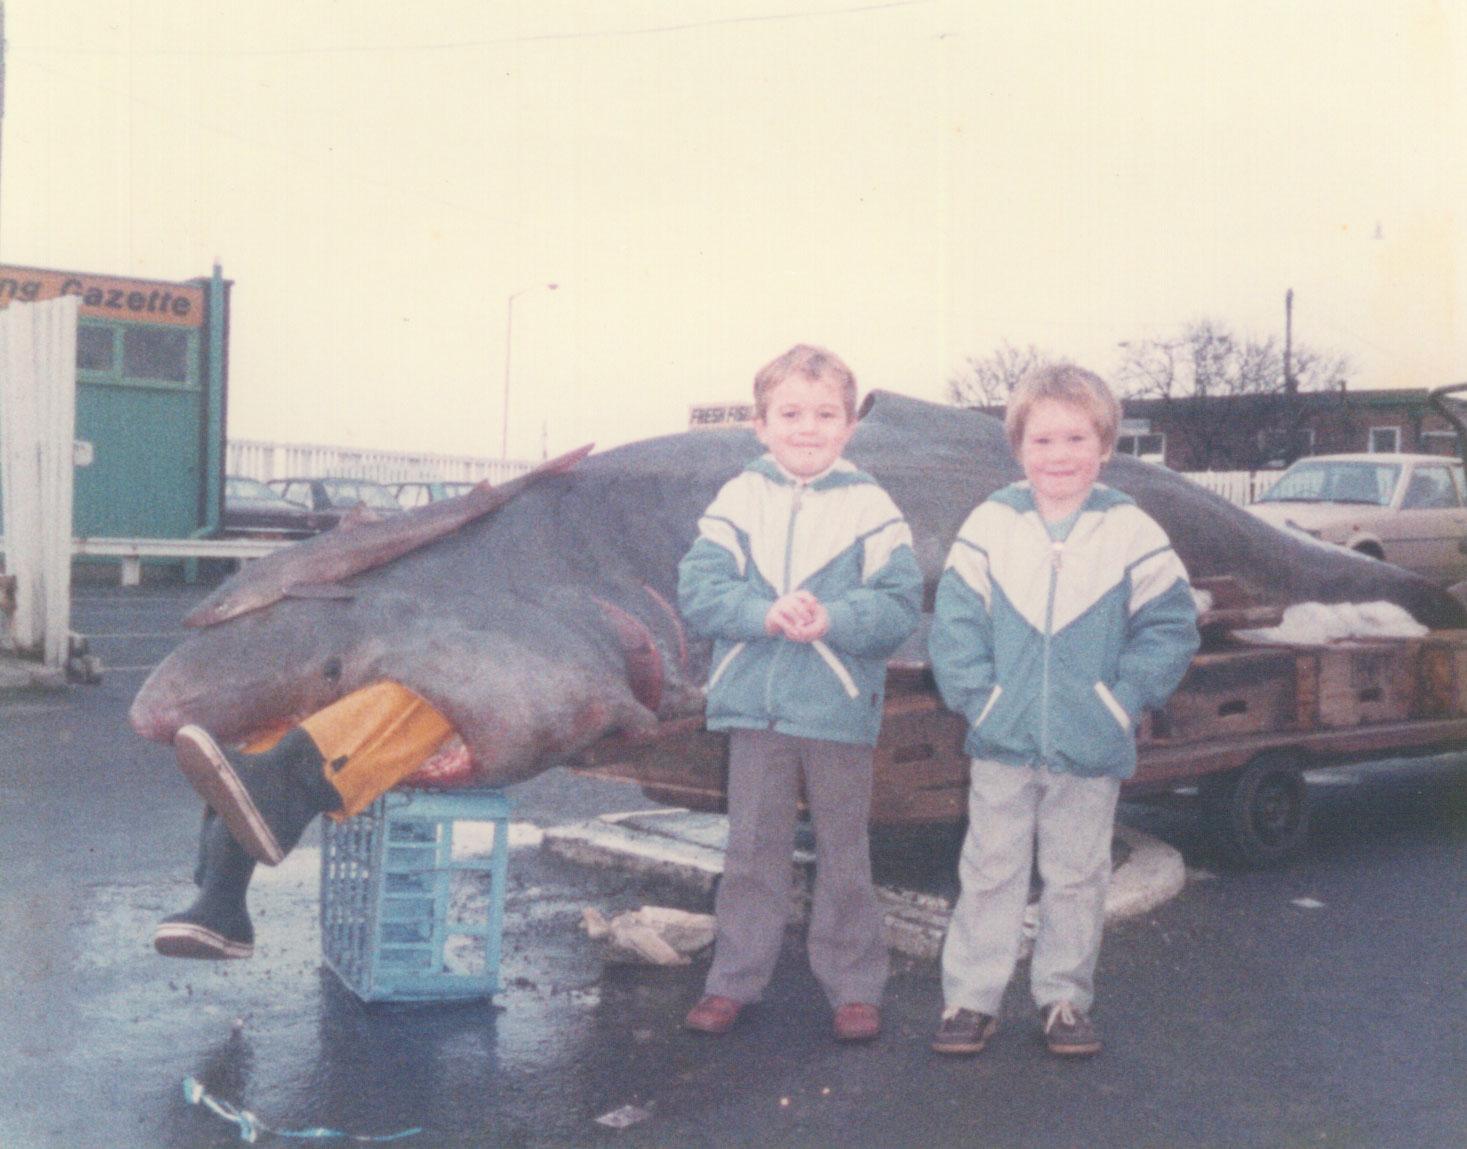 Dockside Seafood Old Photograph 2